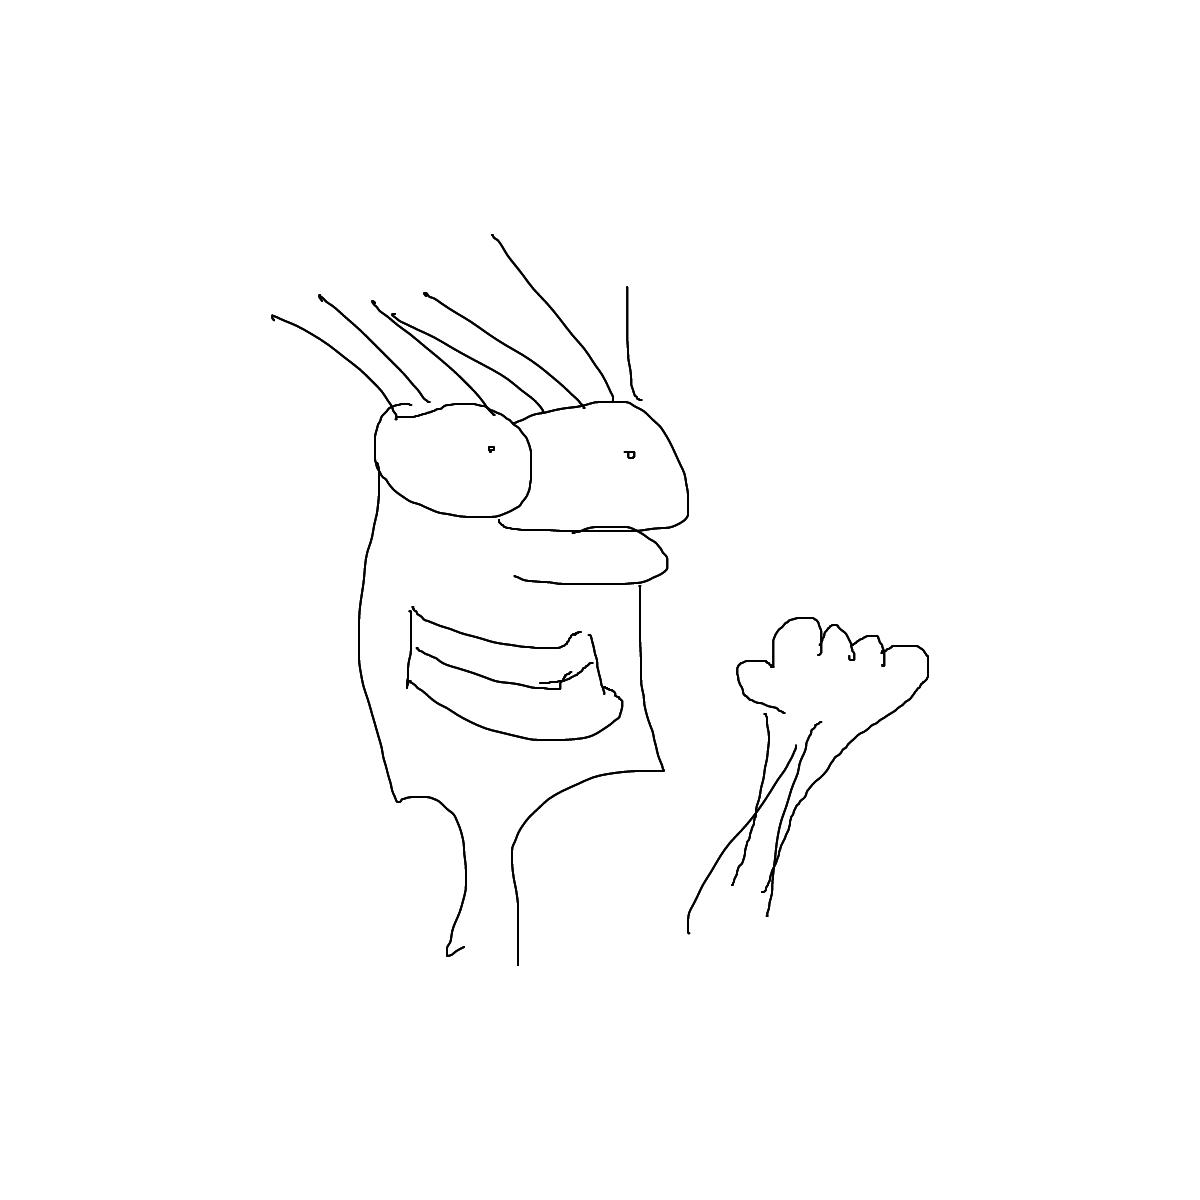 BAAAM drawing#9508 lat:45.3397483825683600lng: -75.9090042114257800